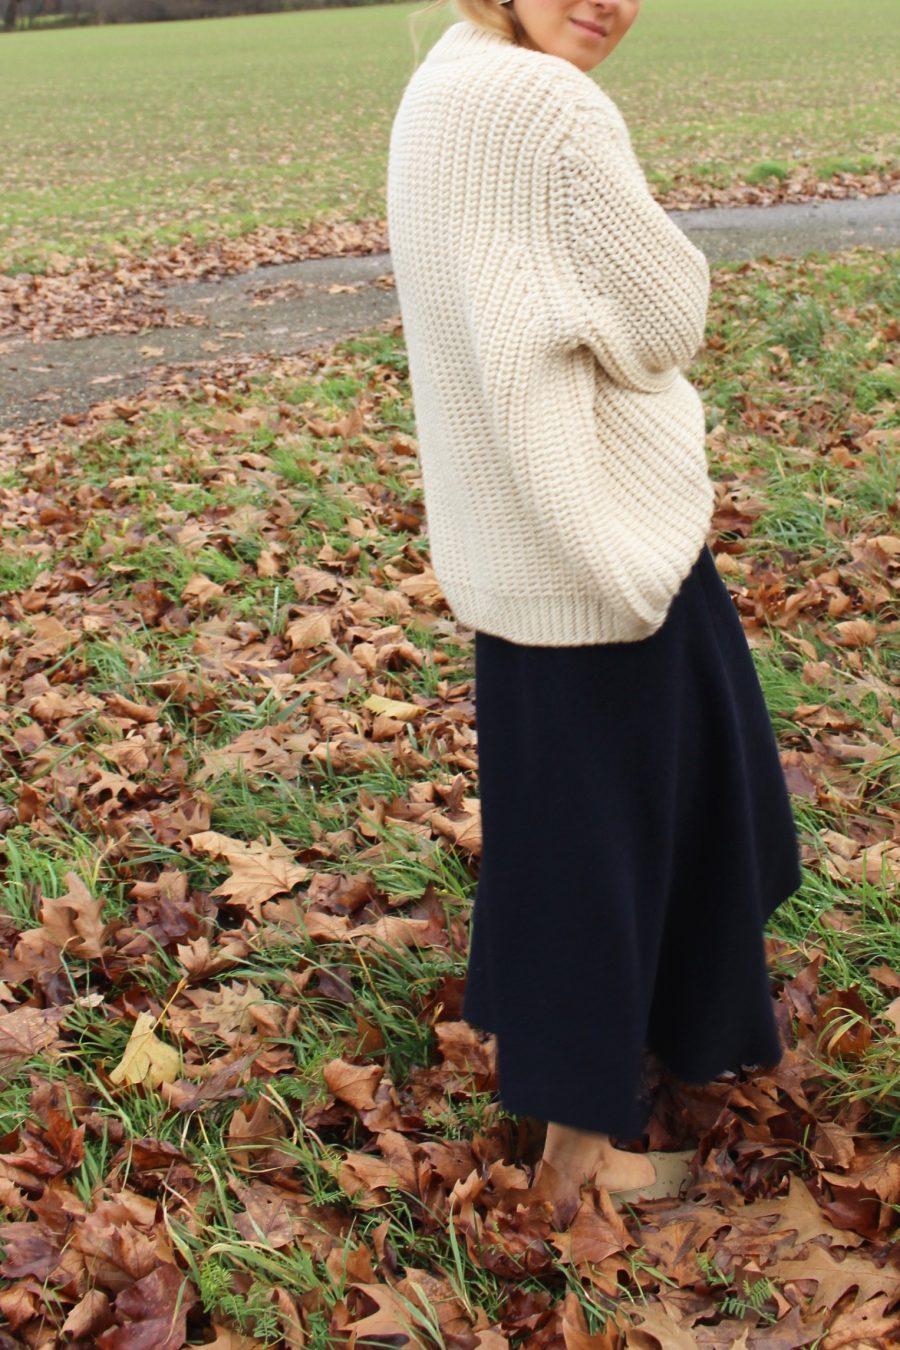 winter skirt 2017 trend midi